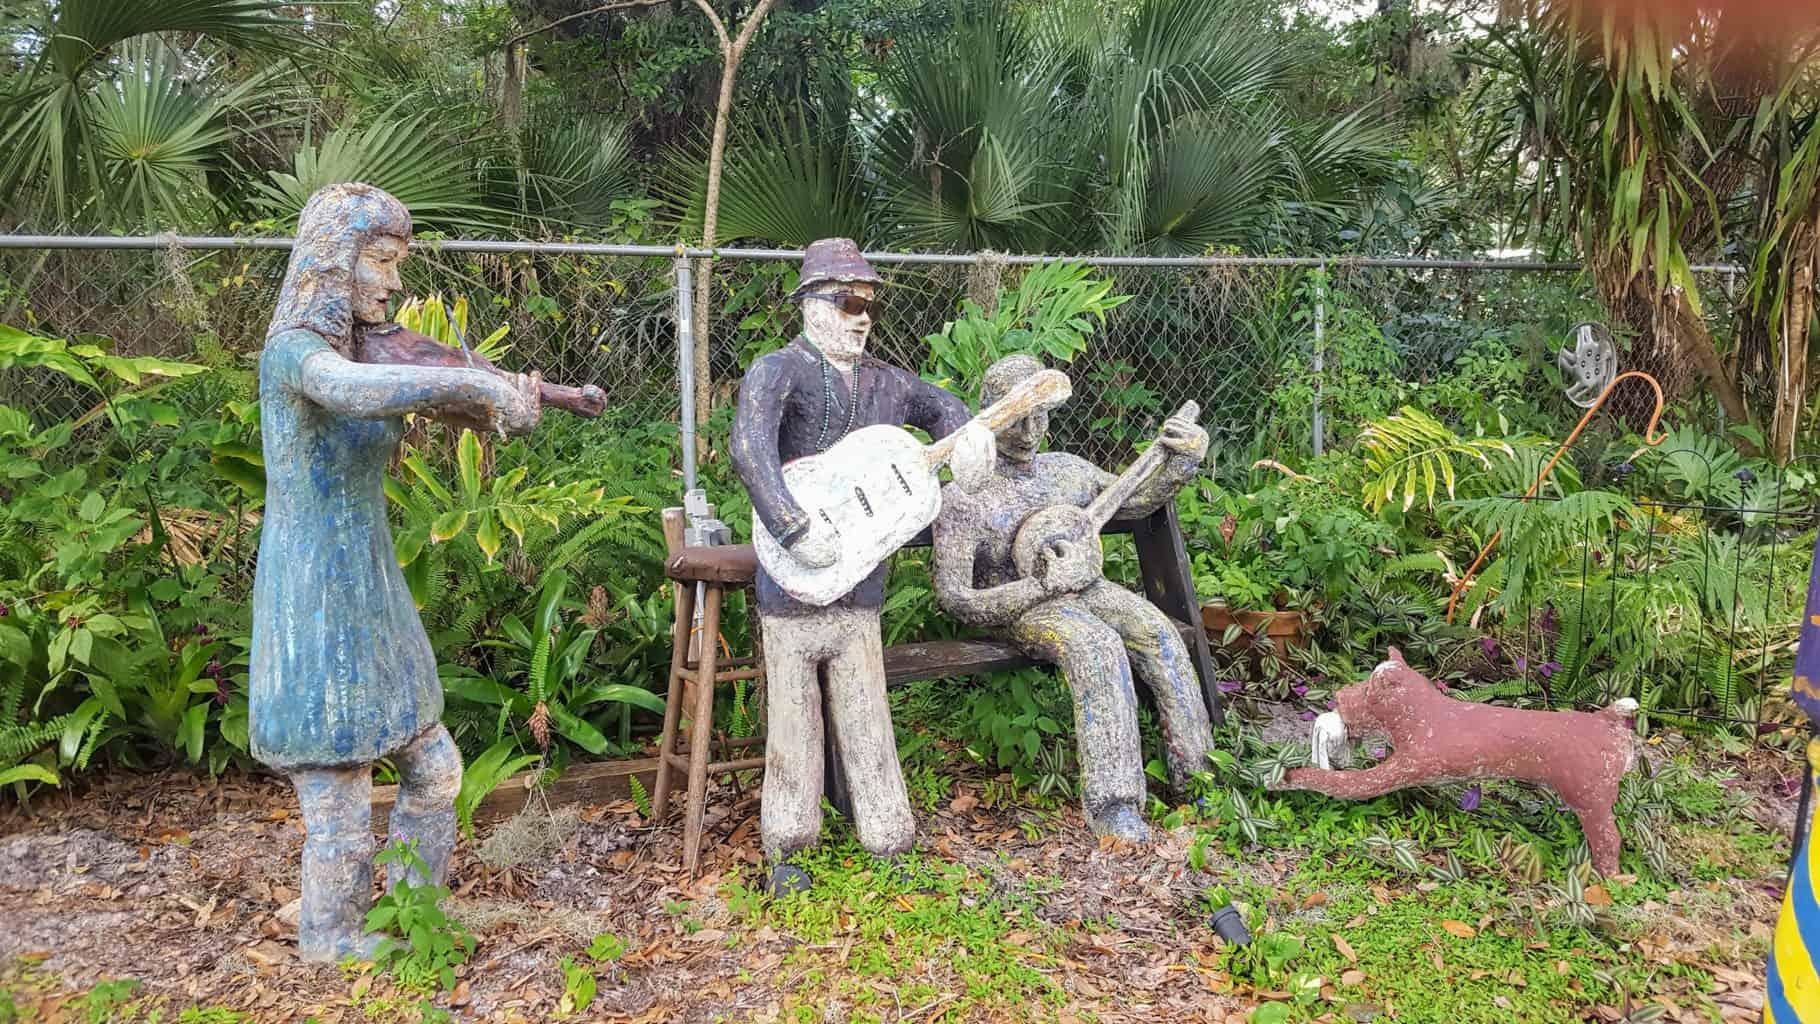 Papercrete figure sculpture-the-band